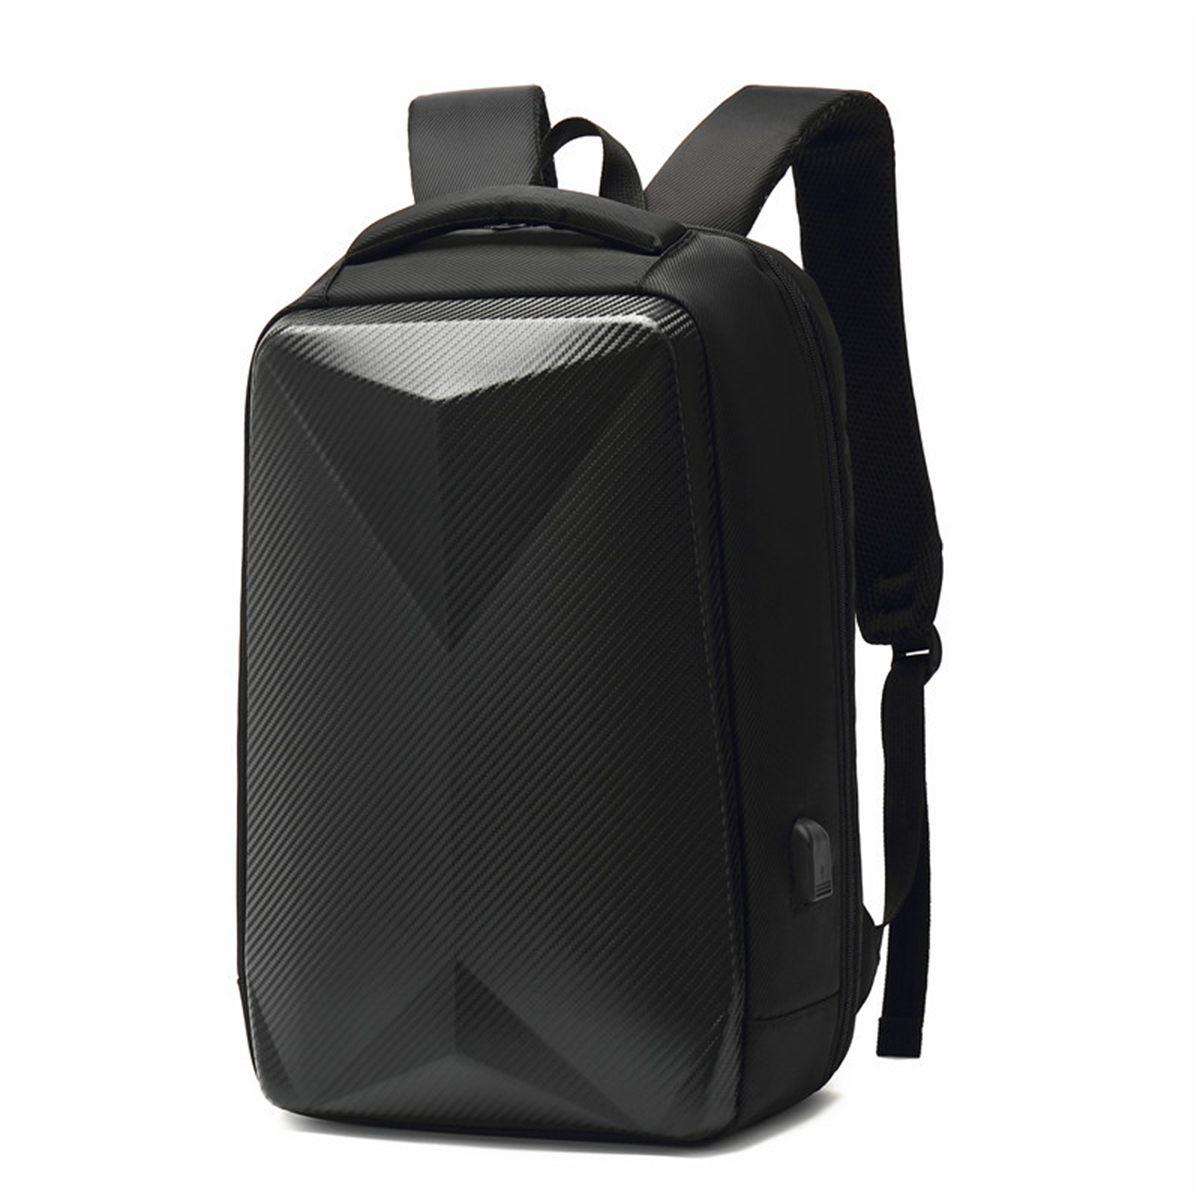 Men Backpack Business Travel Shoulder Bag EVA Anti-theft Waterproof Student Schoolbag USB Charging Laptop Bag with Password Lock